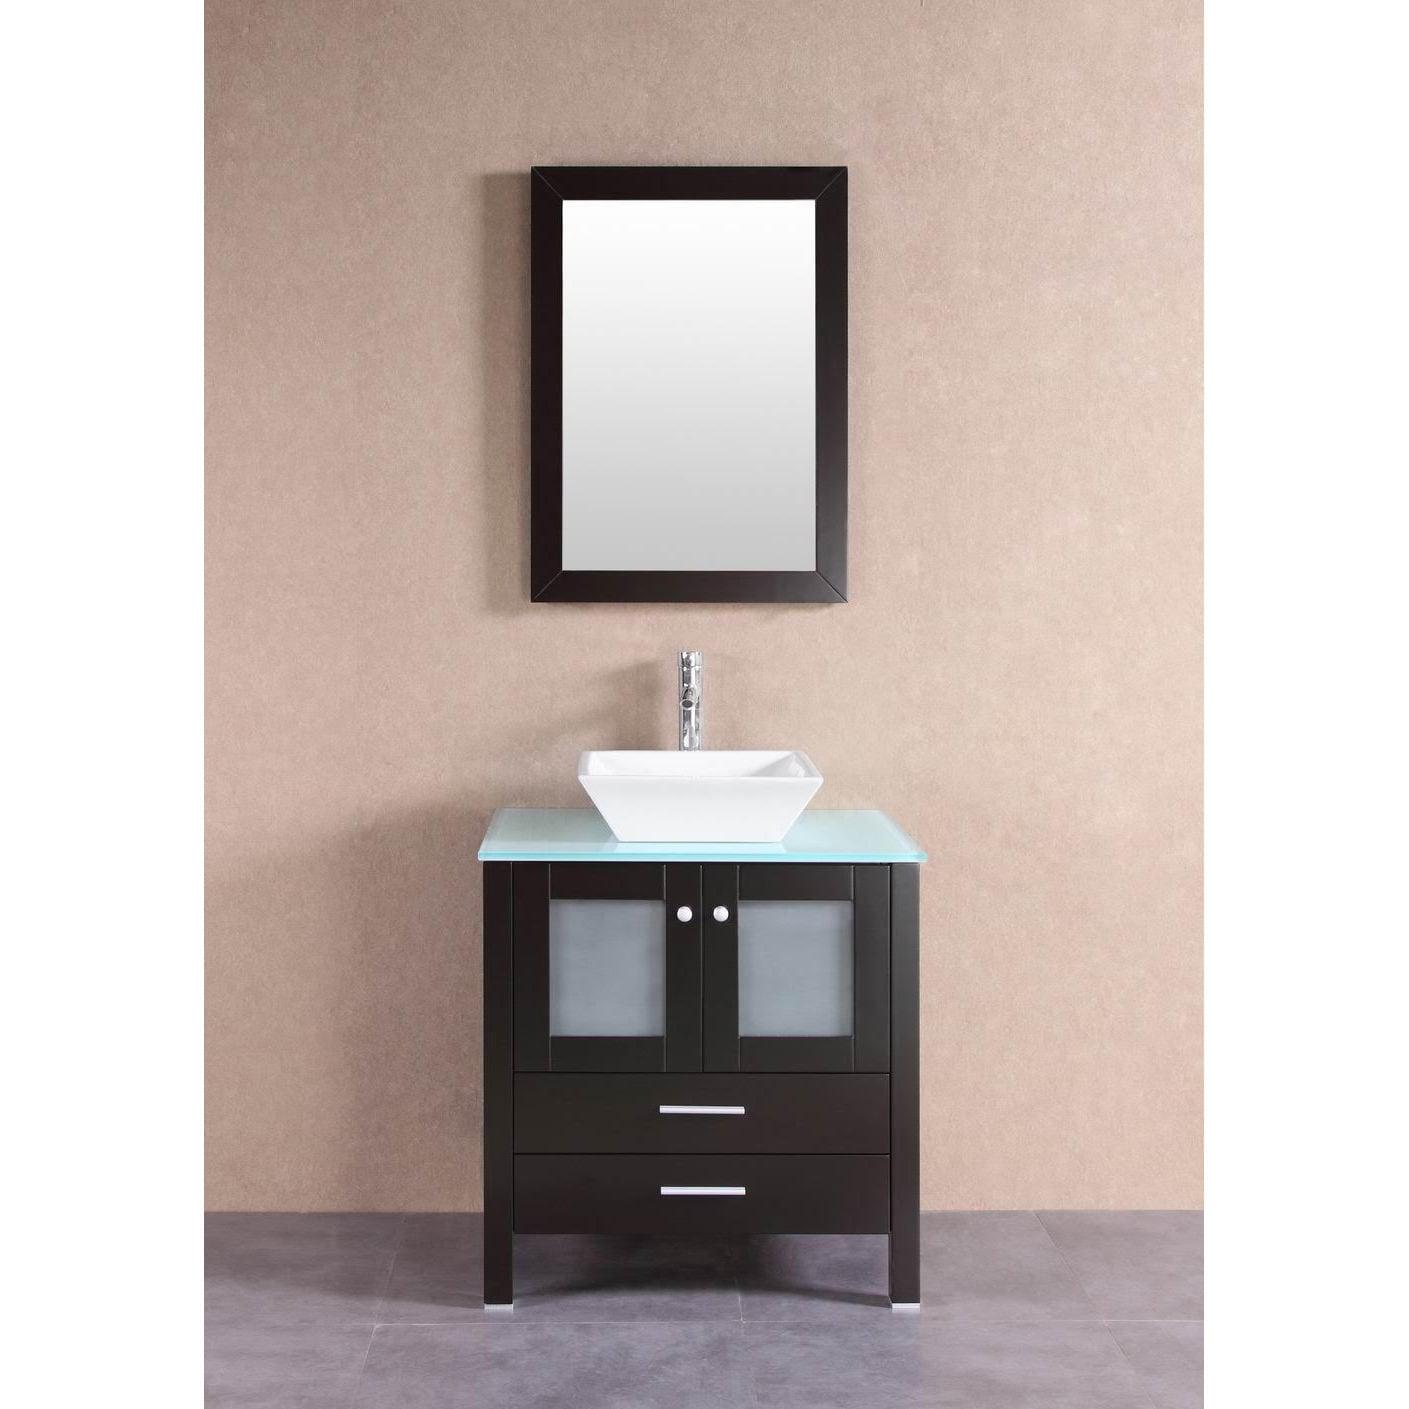 Belvedere Modern Espresso 30 Inch Bathroom Vanity With Glass Top And Vessel Sink